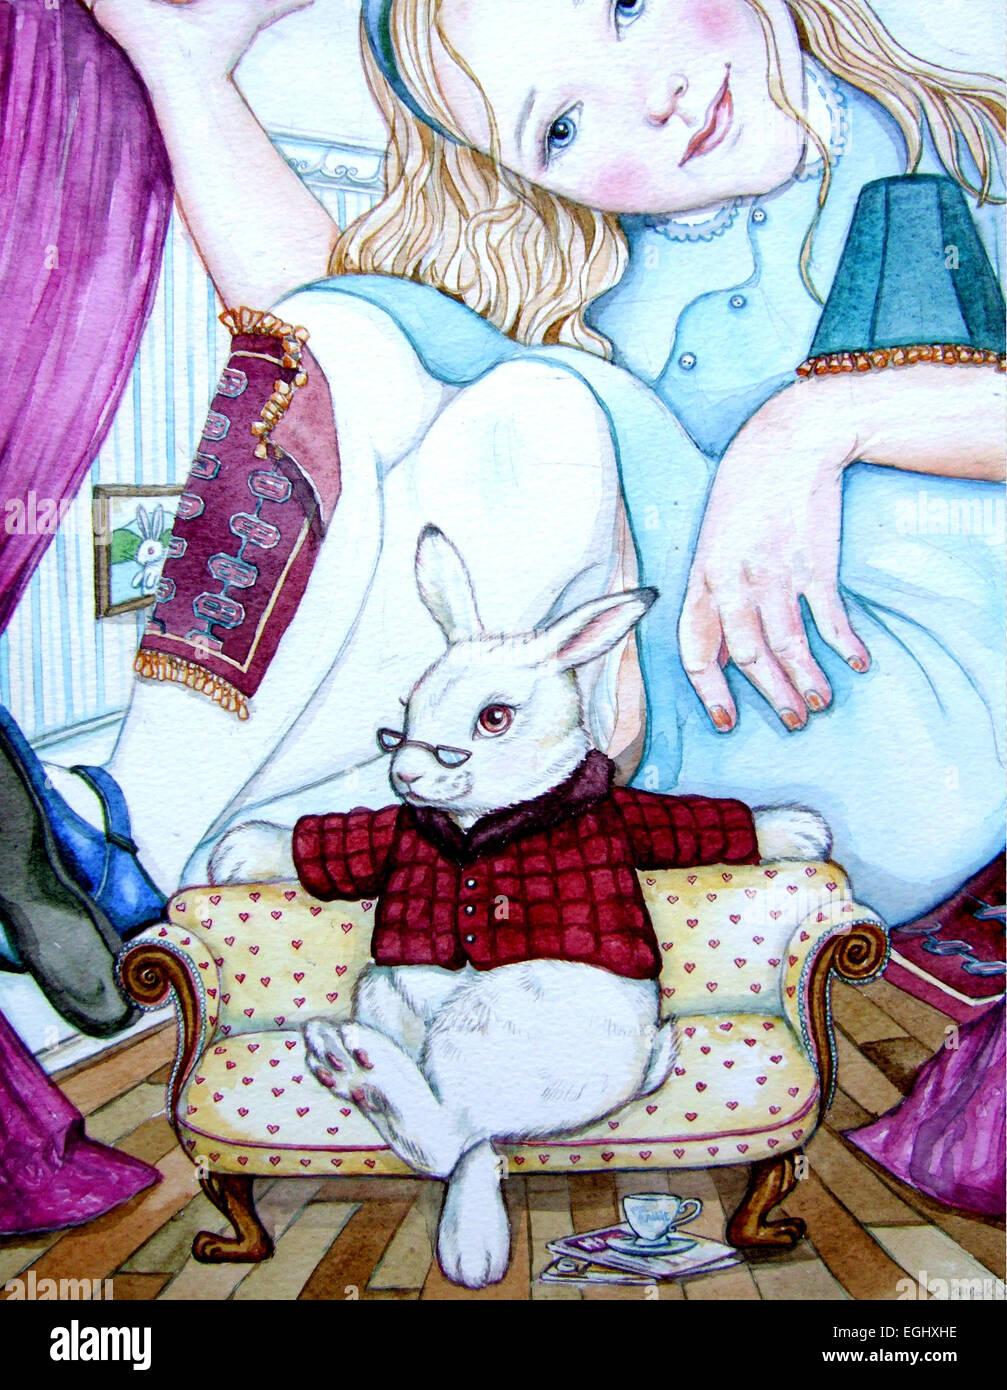 Alice and The White Rabbit - Contemporary watercolour illustration. - Stock Image